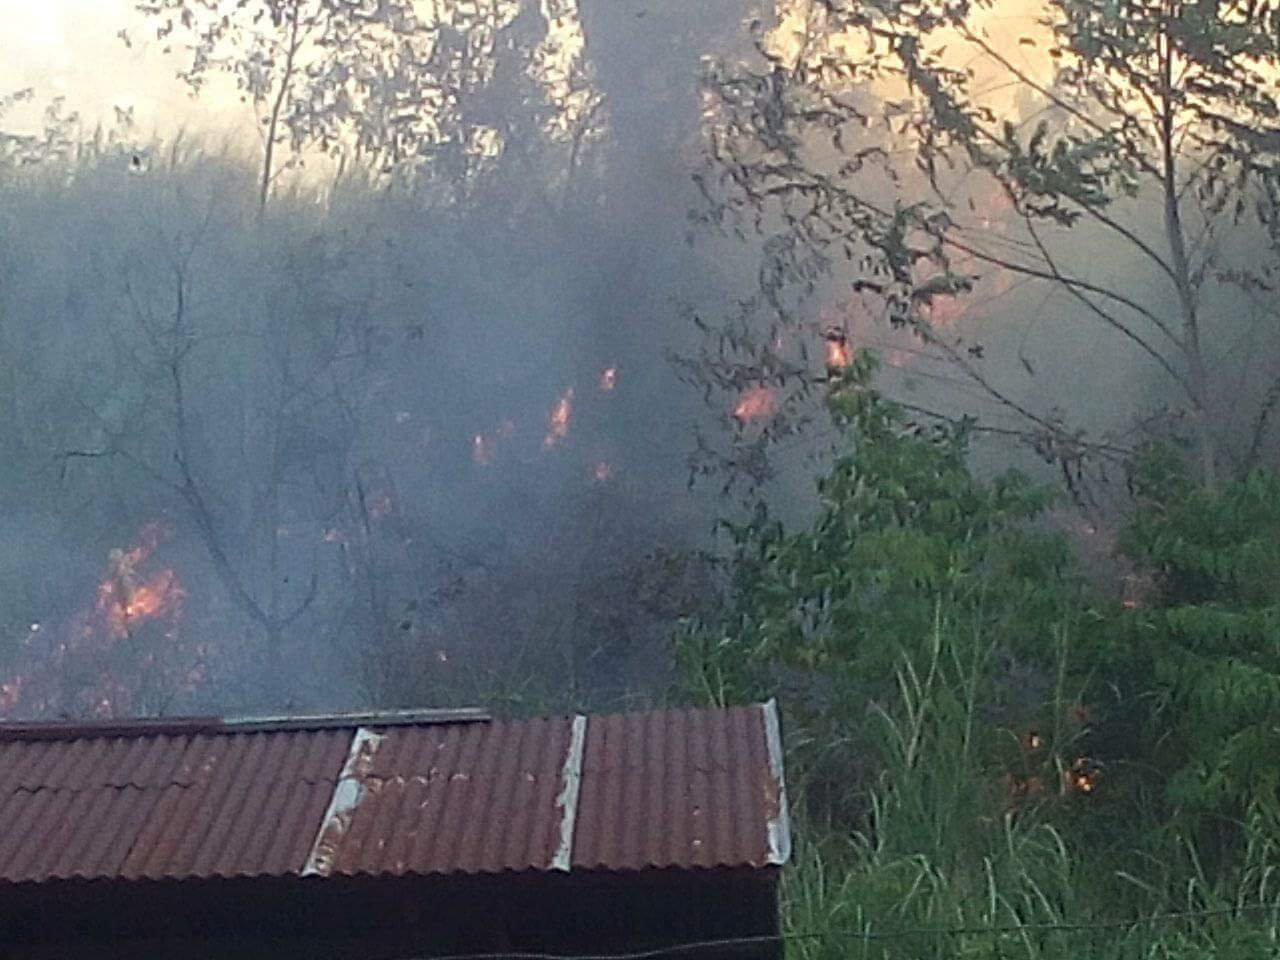 Kebakaran Lahan di Gunung Sasayaban Amurang Ancam Pemukiman Warga